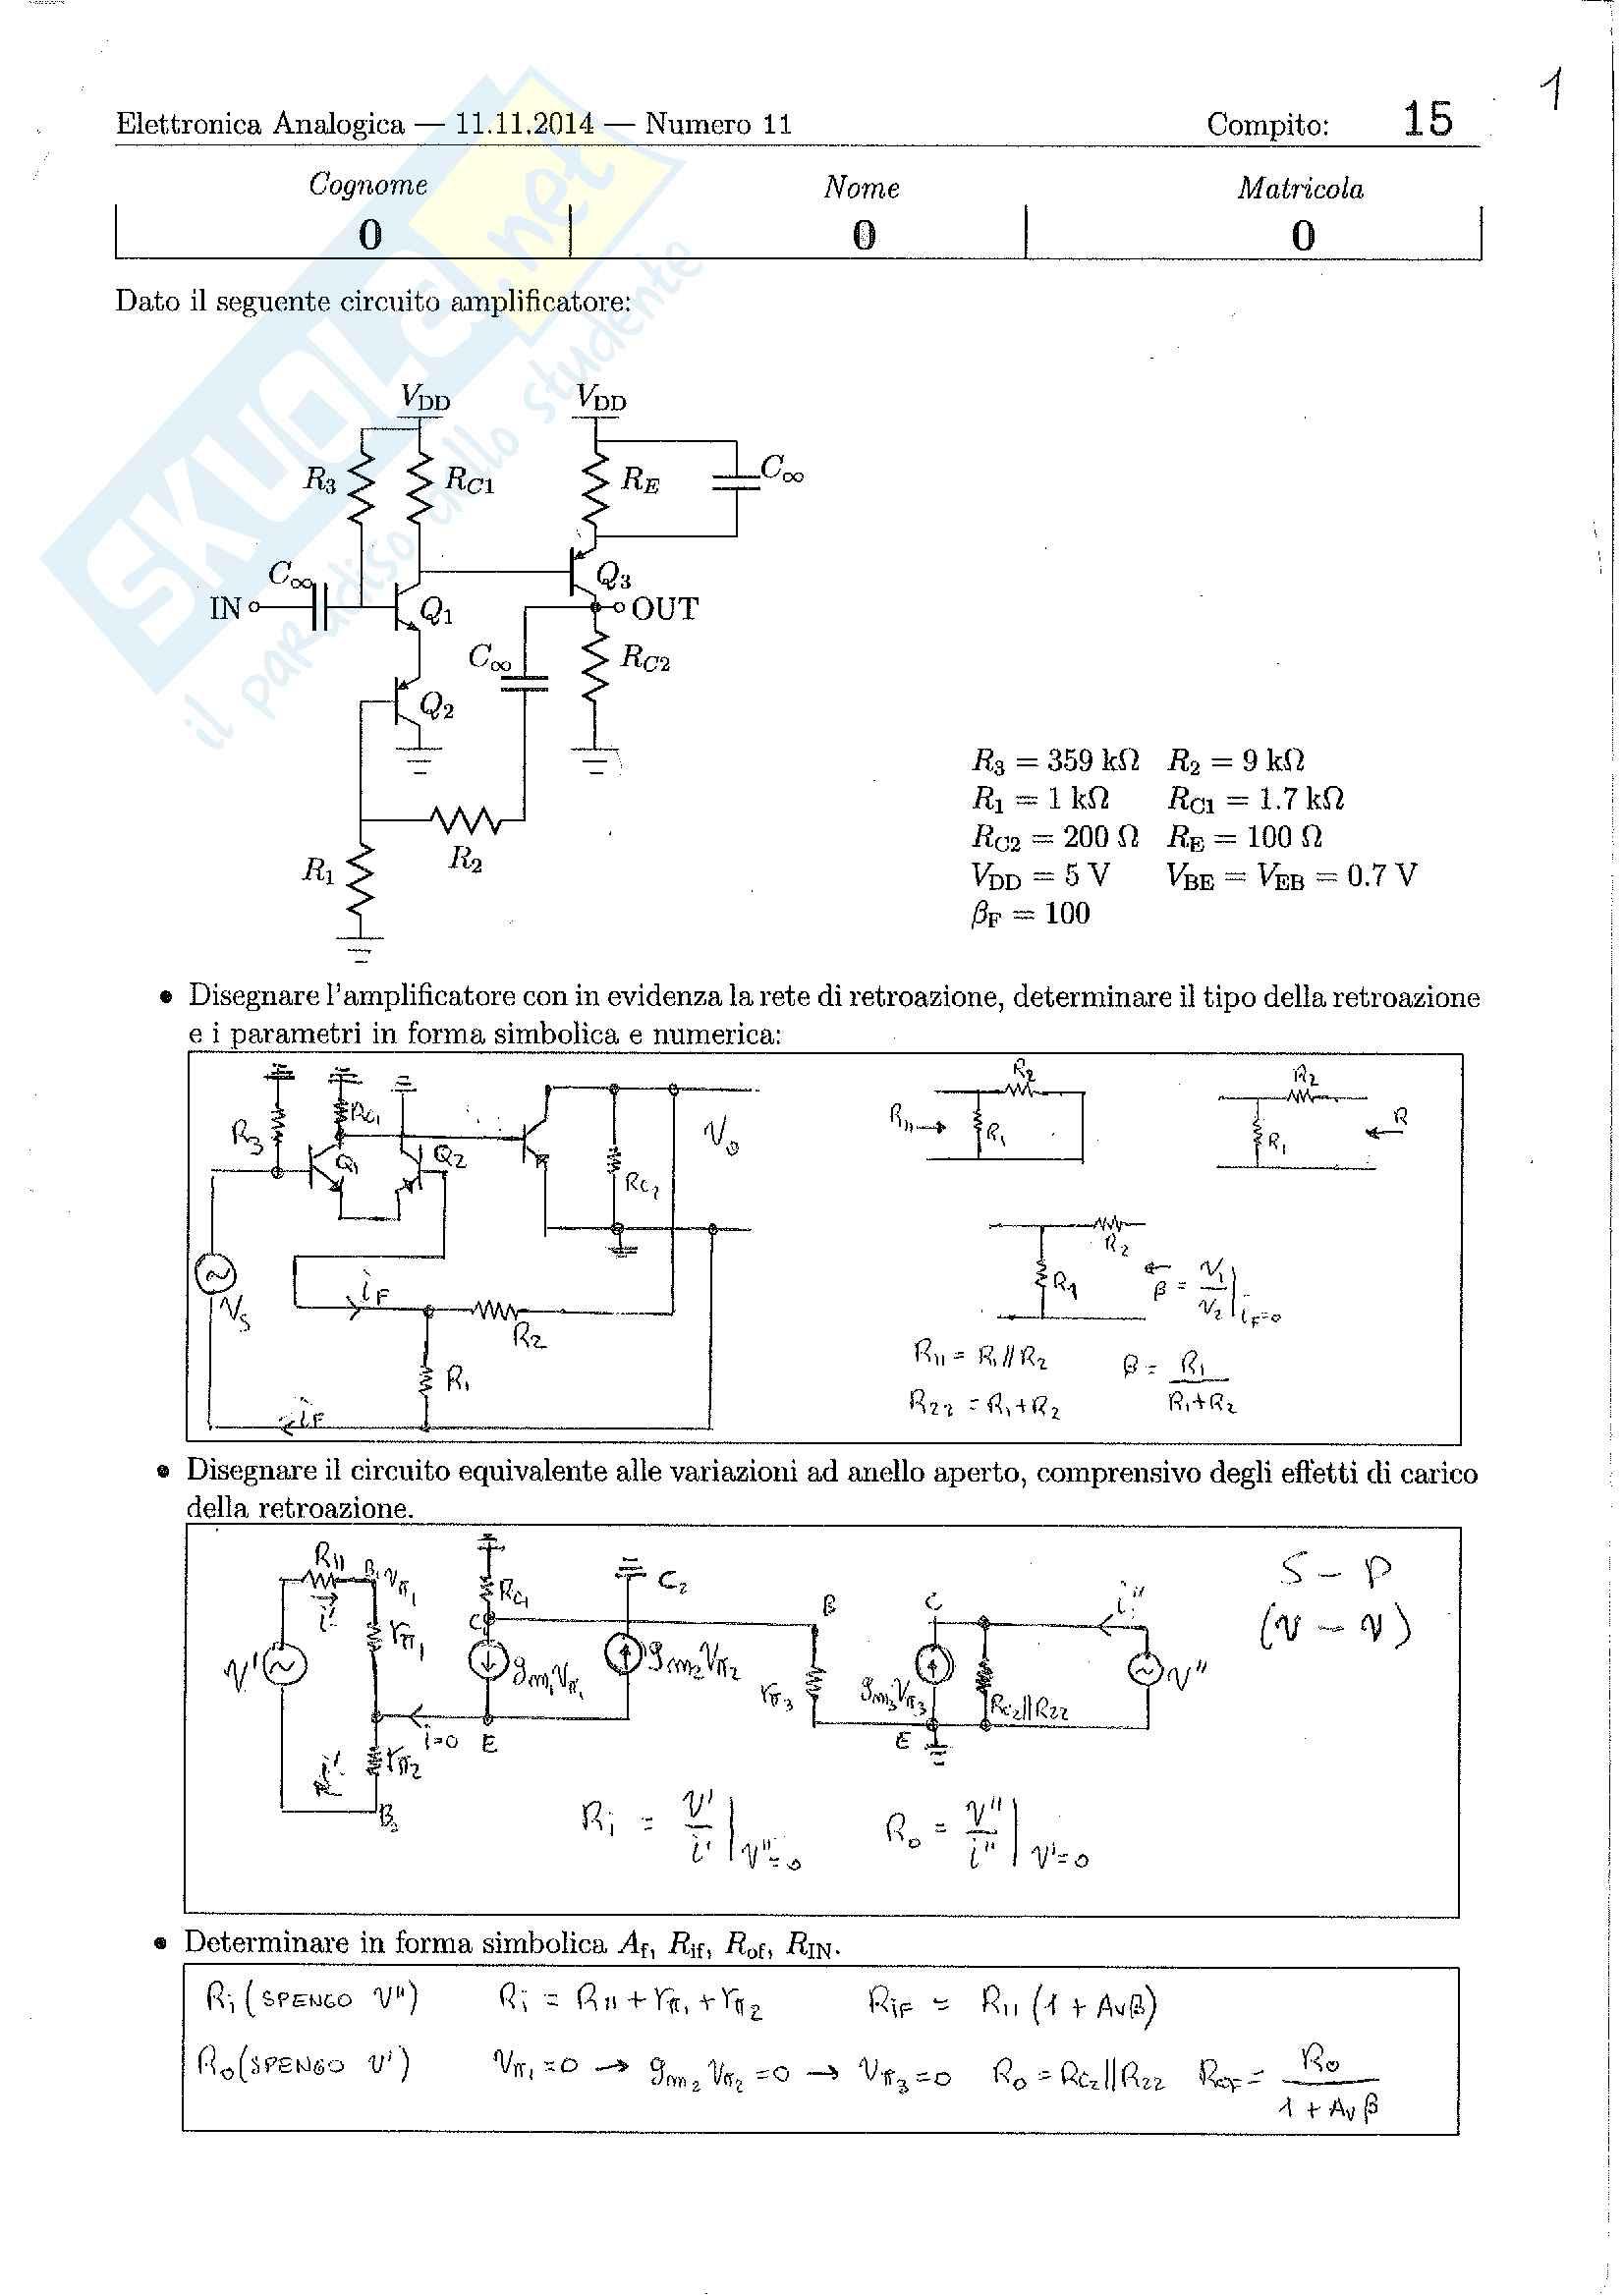 Elettronica Analogica - Esercizi